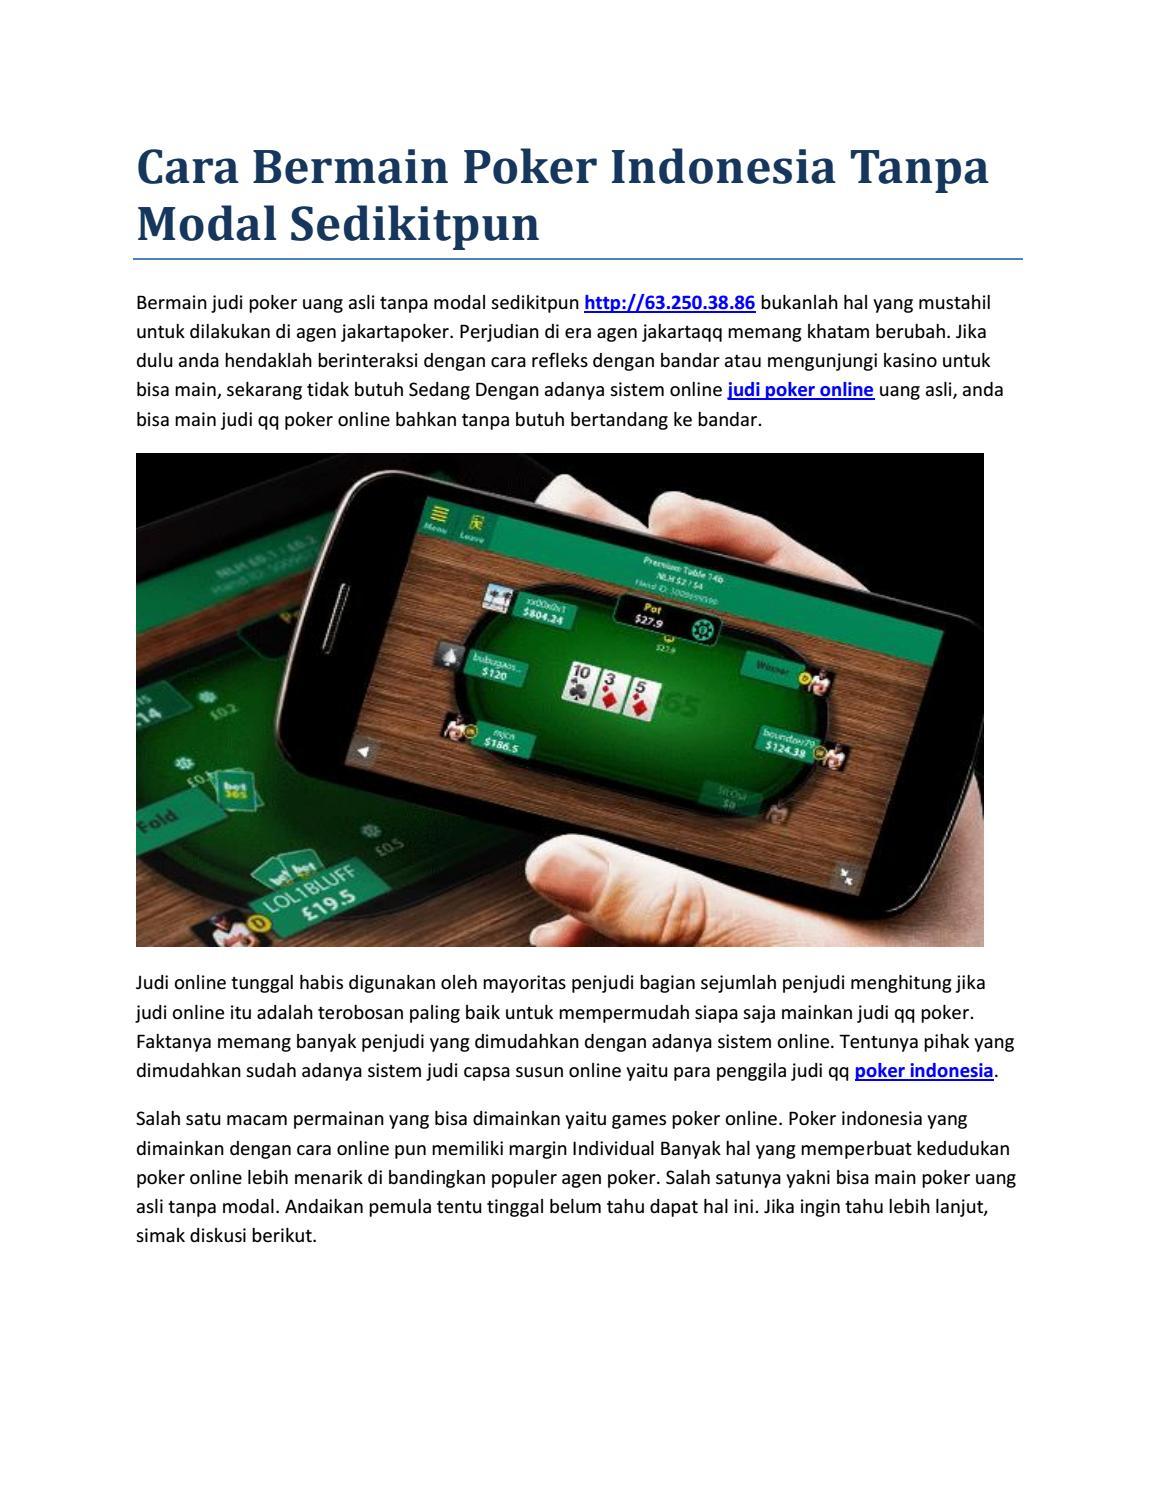 Main Poker Dapat Uang Tanpa Modal - couveuselacapitelle.com